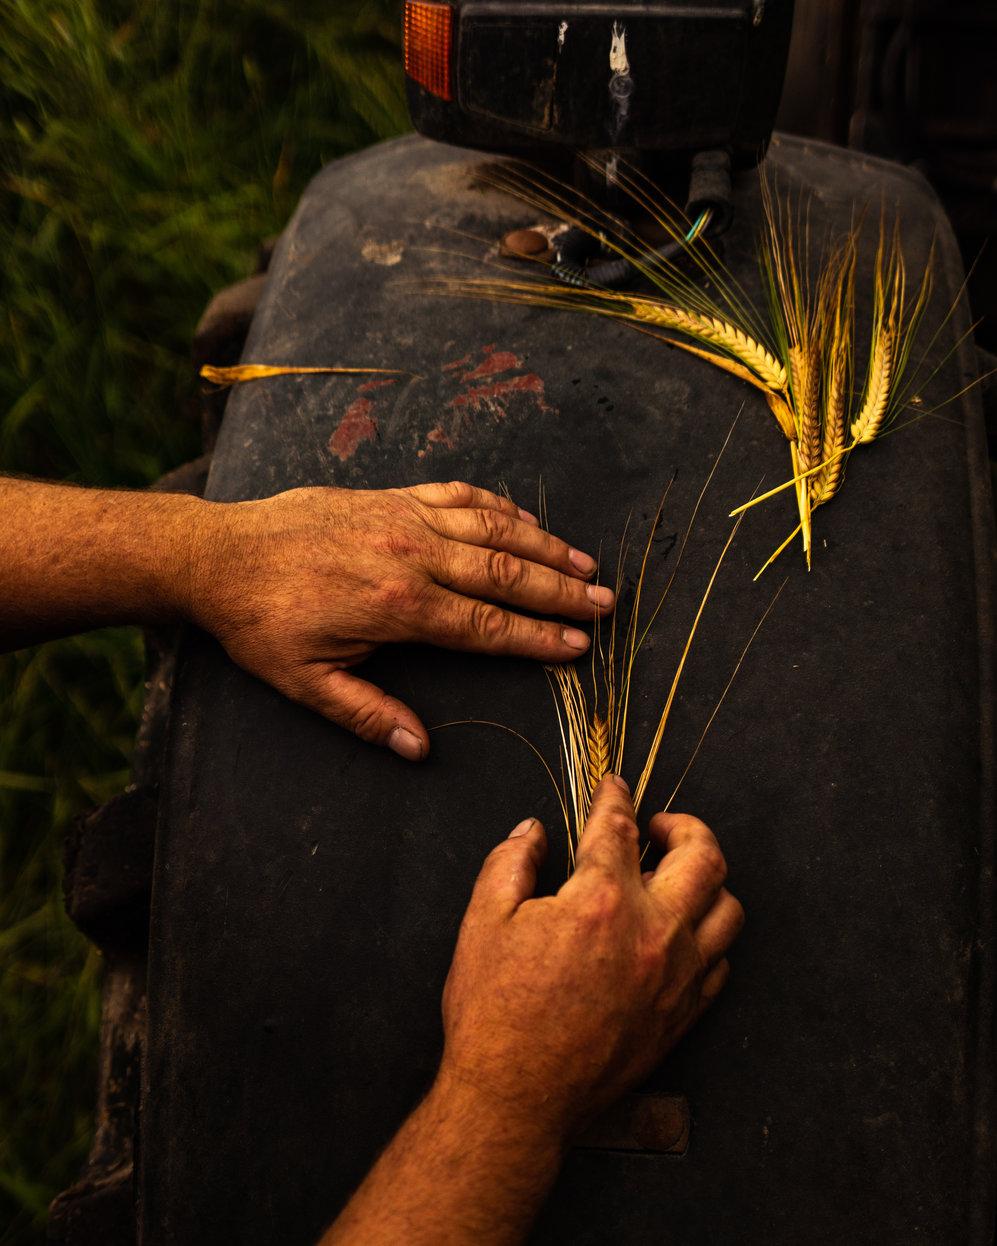 rsz_wd-seamus-duggan-midseason-harvest-web-29